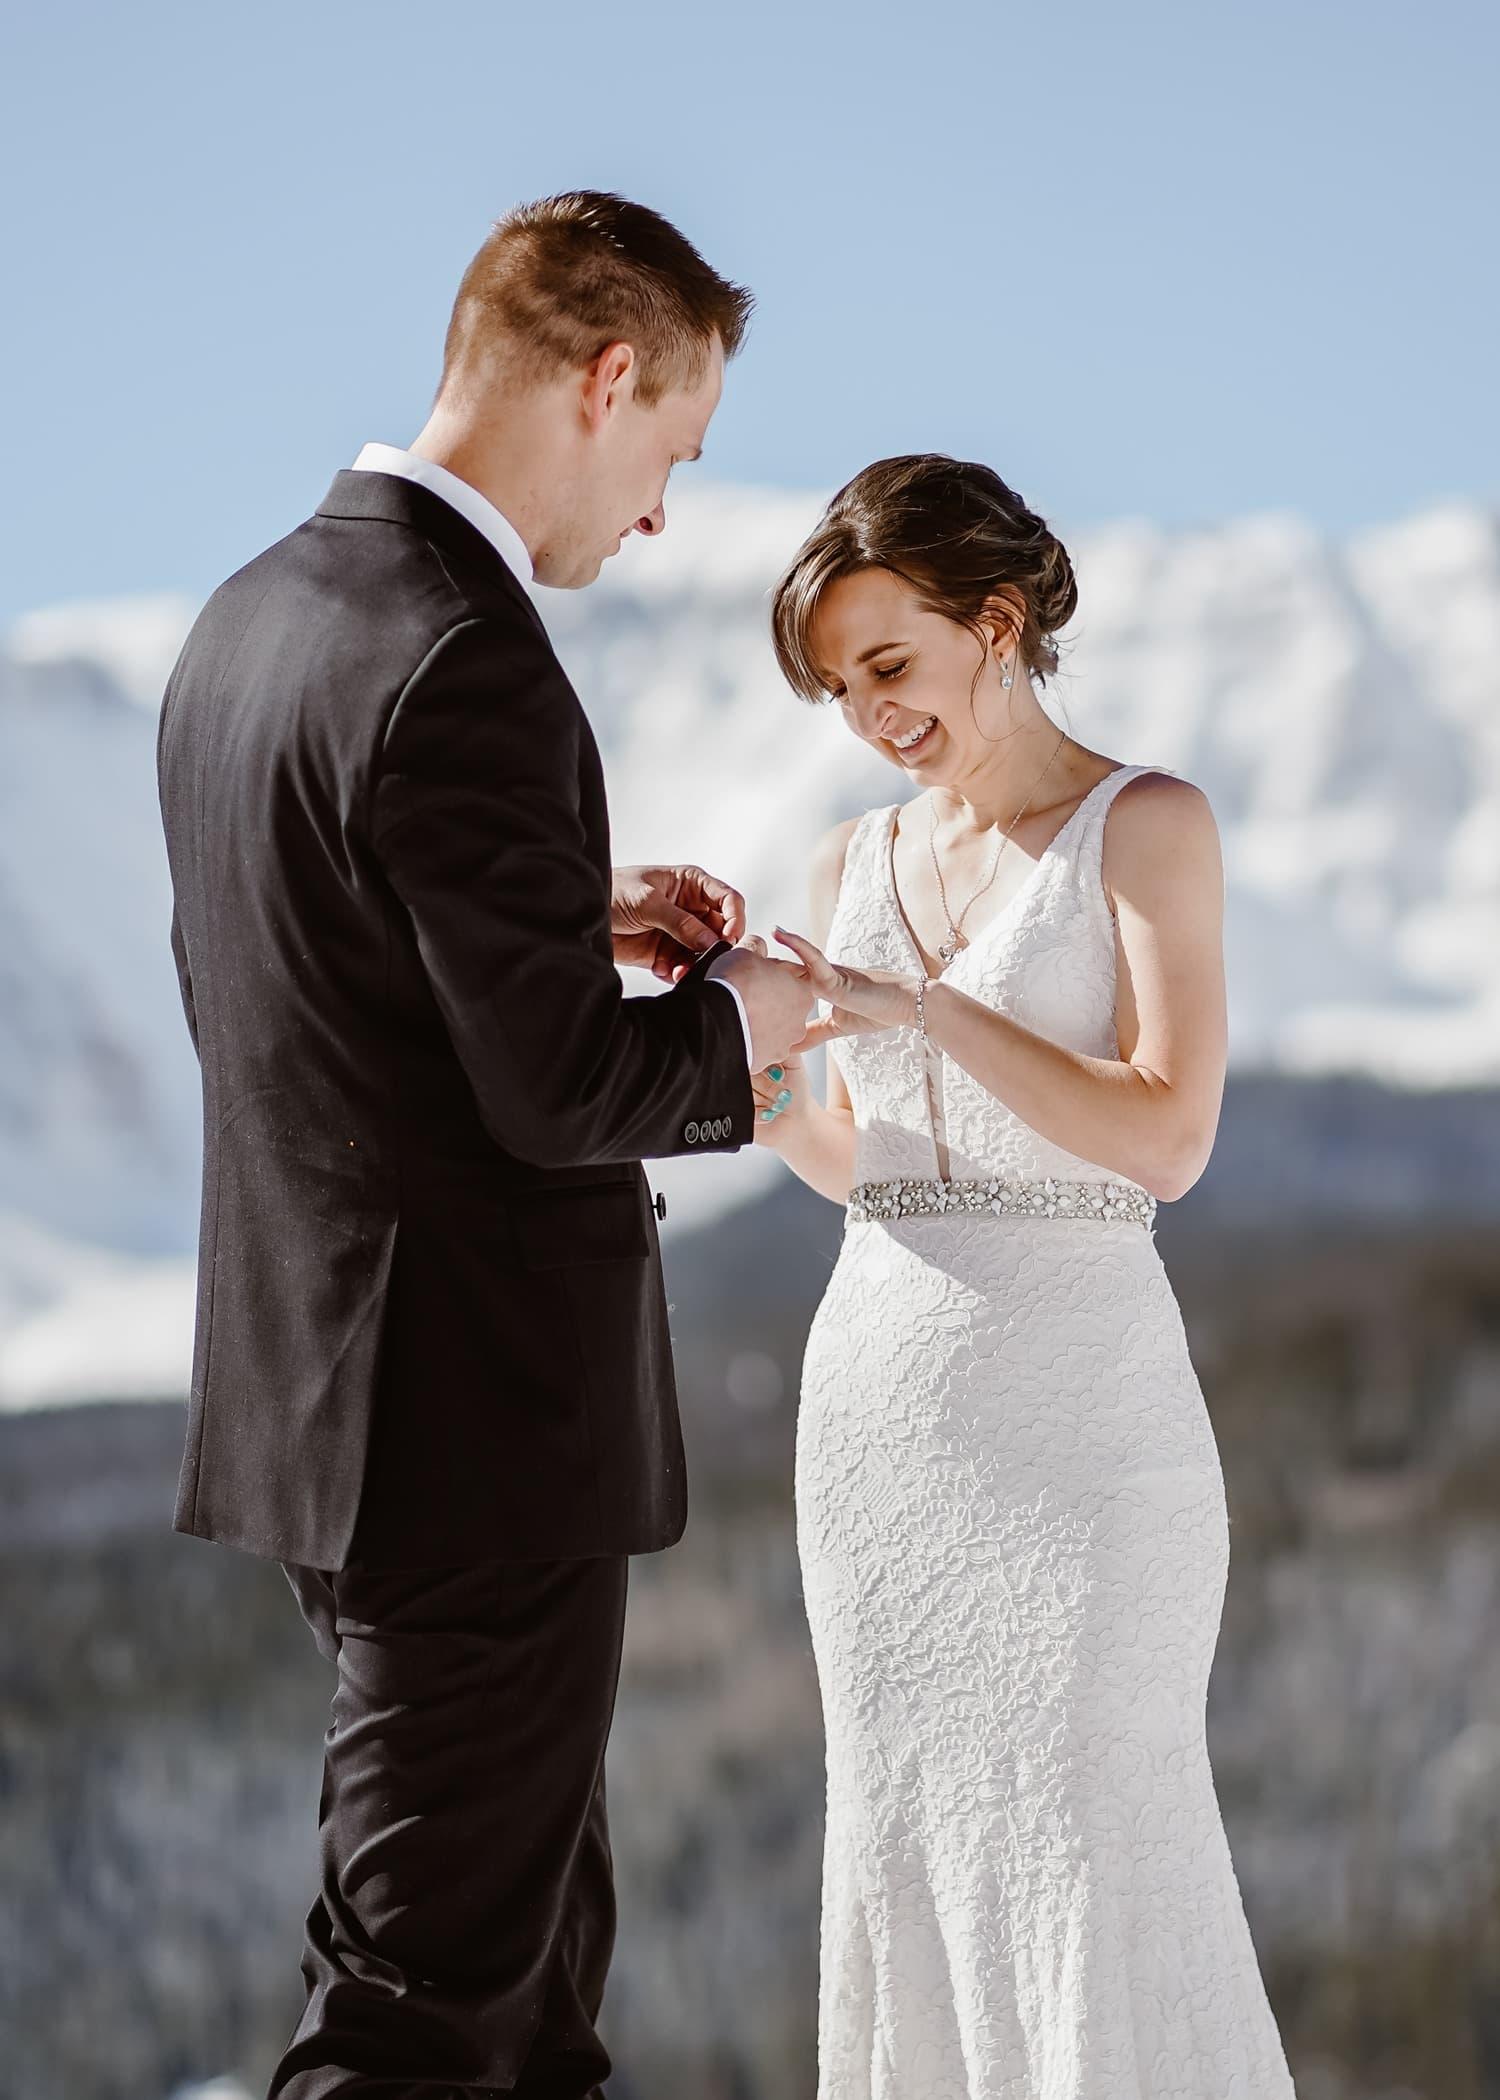 Ring Exchange at Telluride Elopement